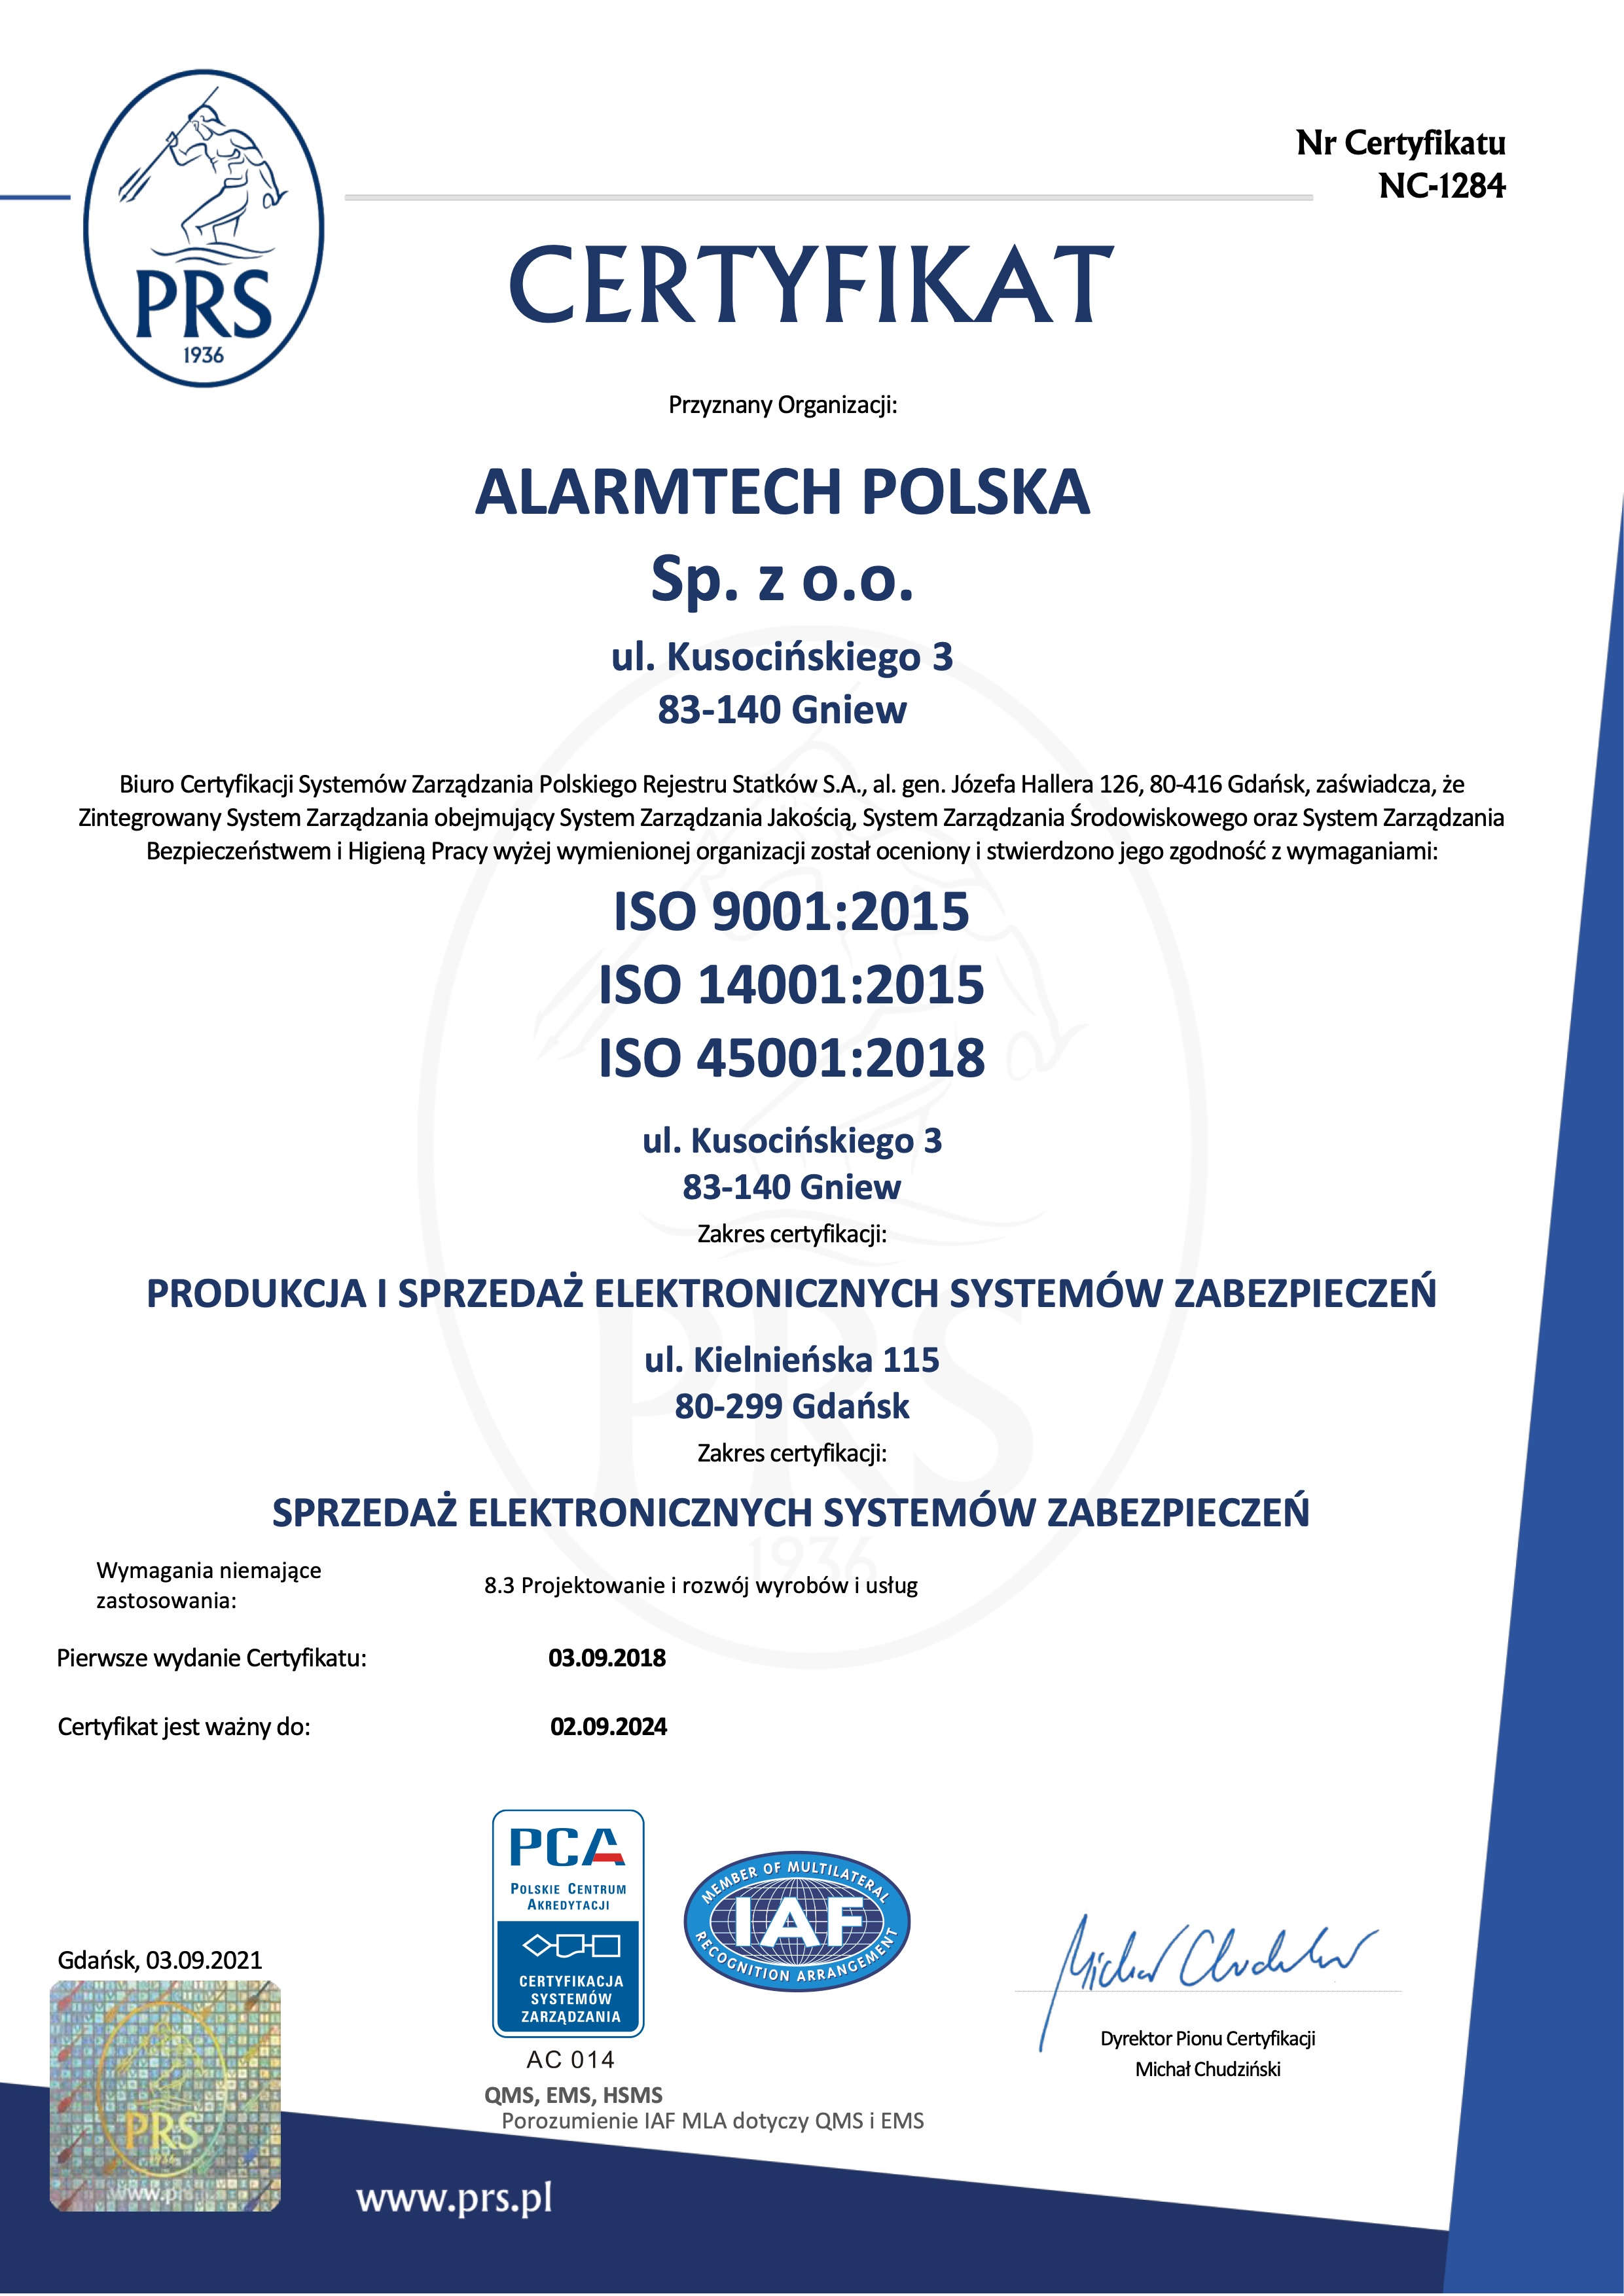 ISO 9001:2015, ISO 14001:2015, ISO 45001:2018